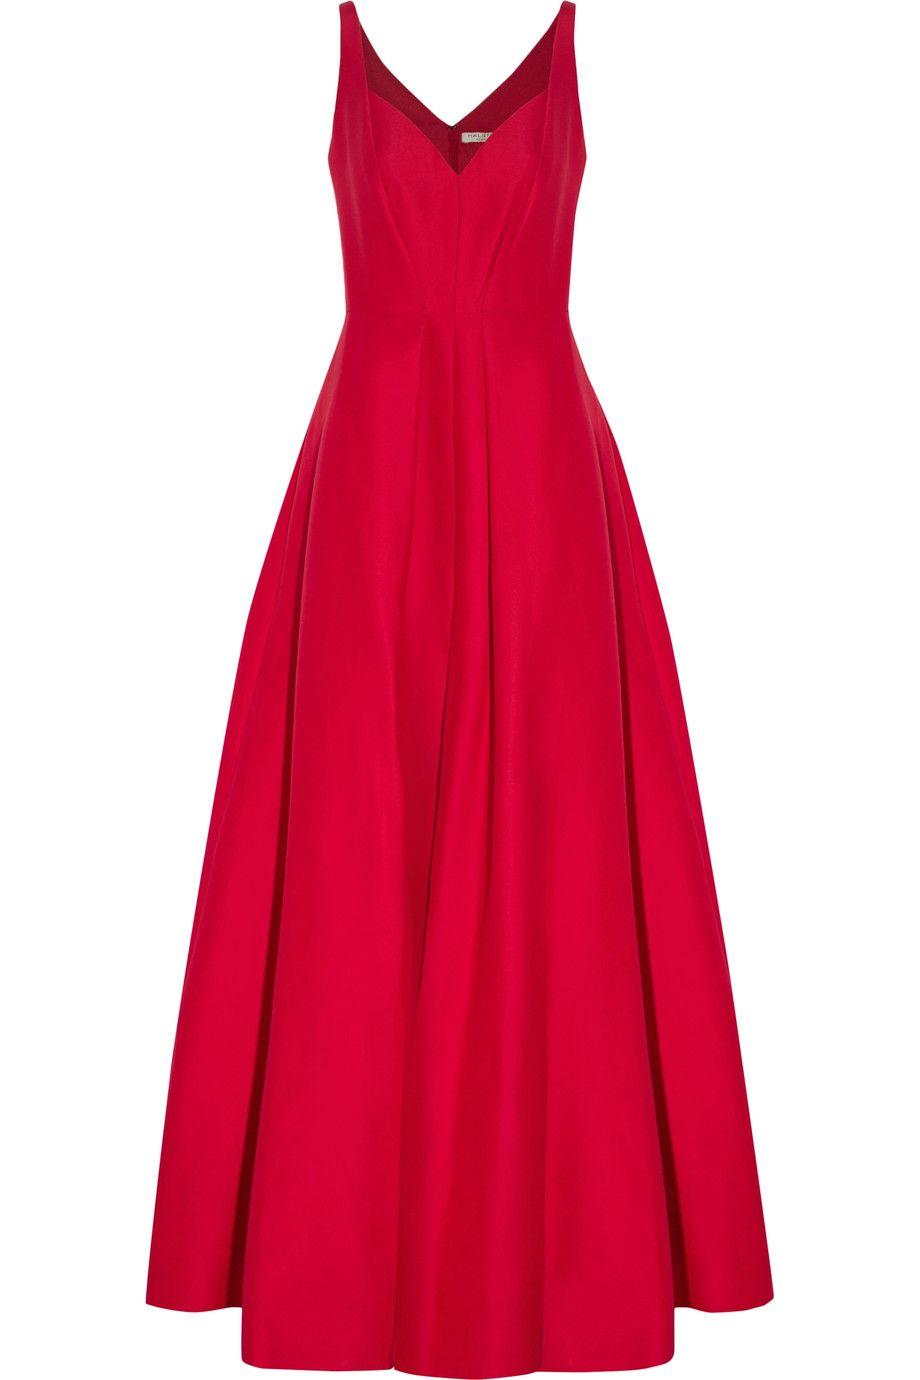 0921658f060 HALSTON HERITAGE .  halstonheritage  cloth  gown